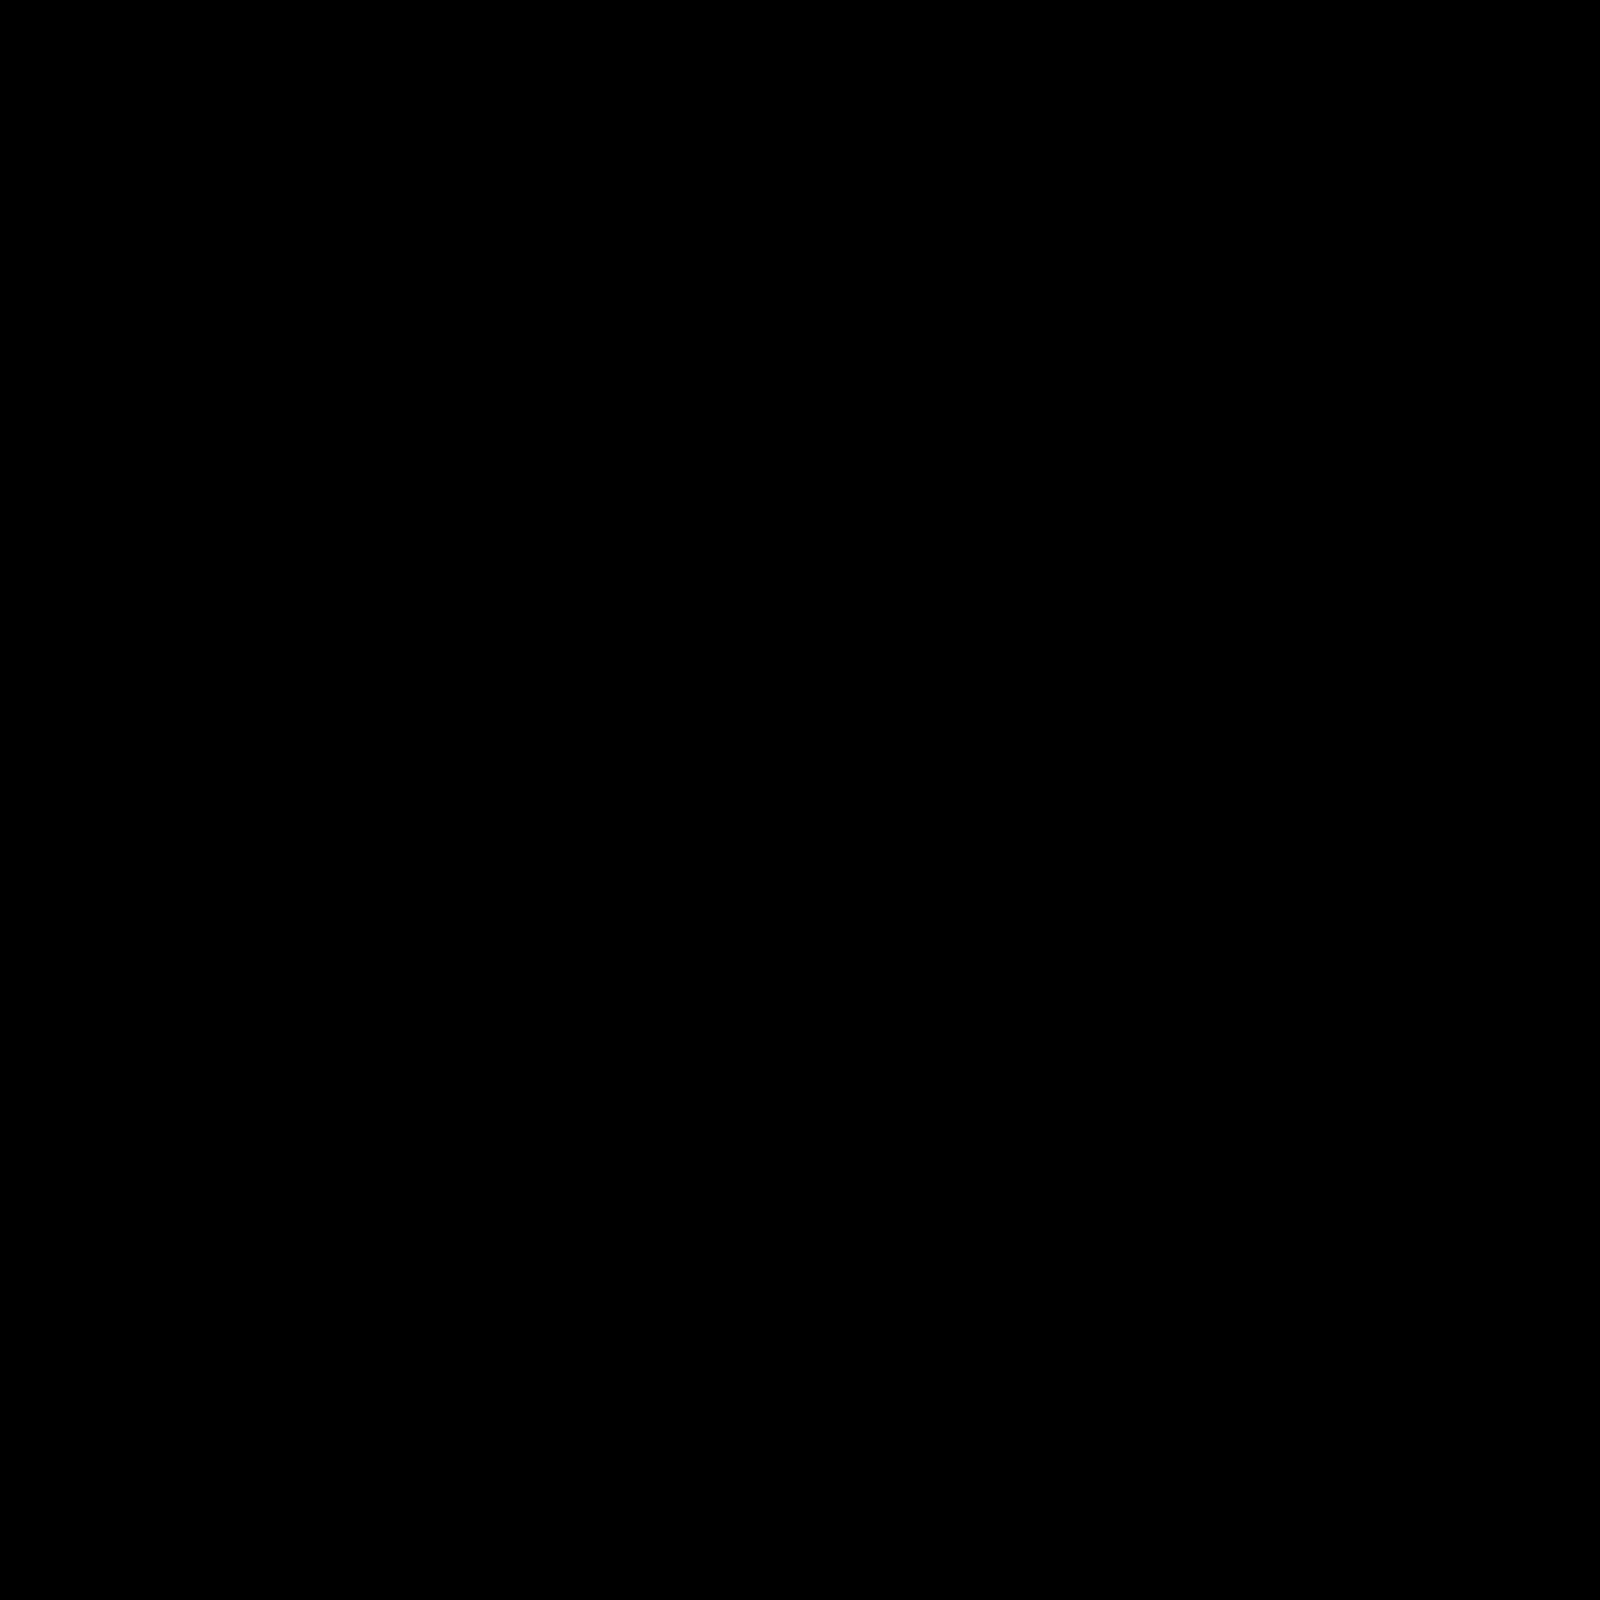 500+ Apple LOGO - Latest Apple Logo, Icon, GIF ...